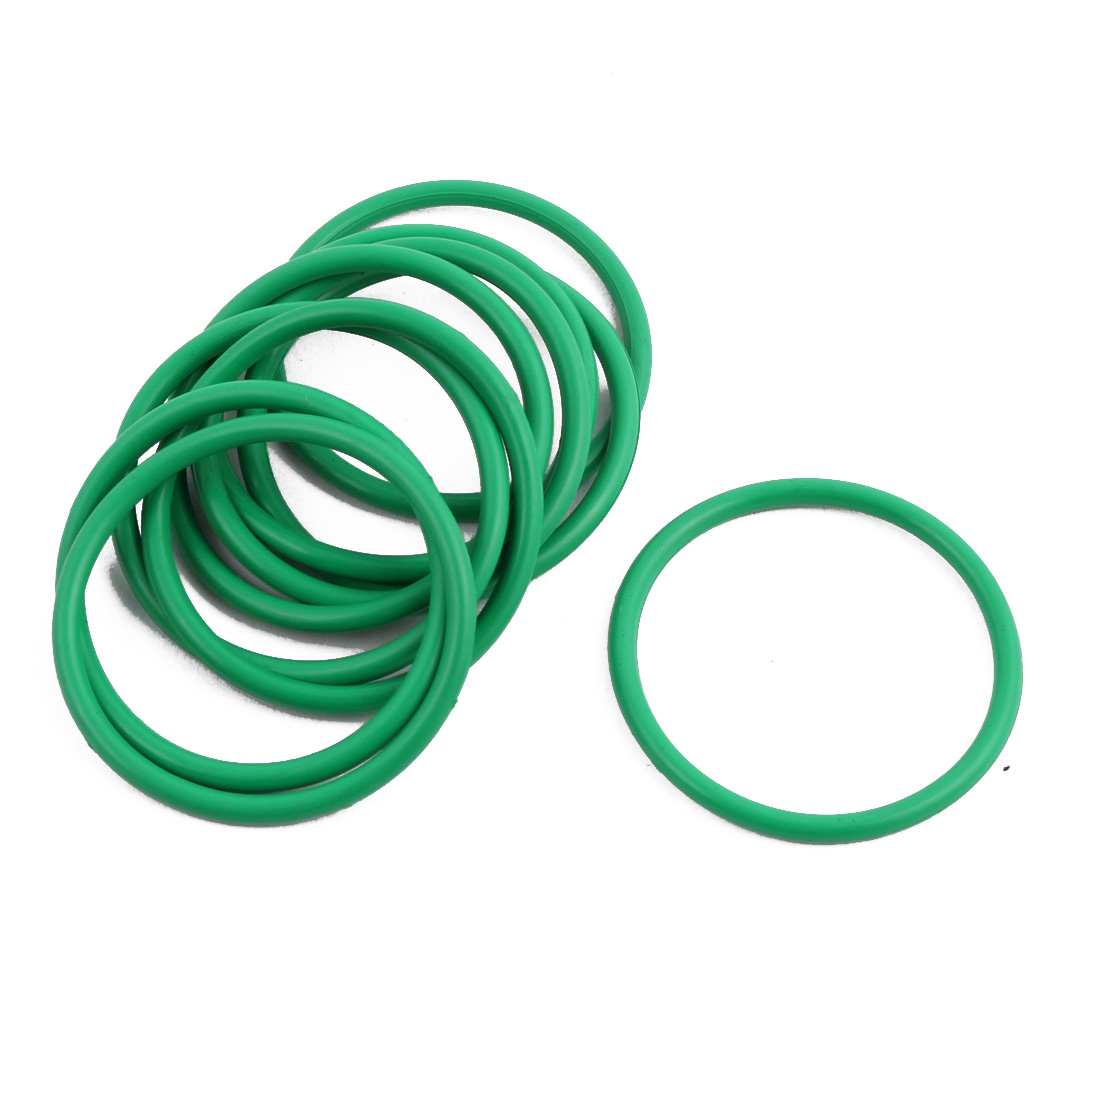 10Pcs Green 27 x 1.9mm Industrial Flexible Rubber O Ring Oil Sealing Grommets